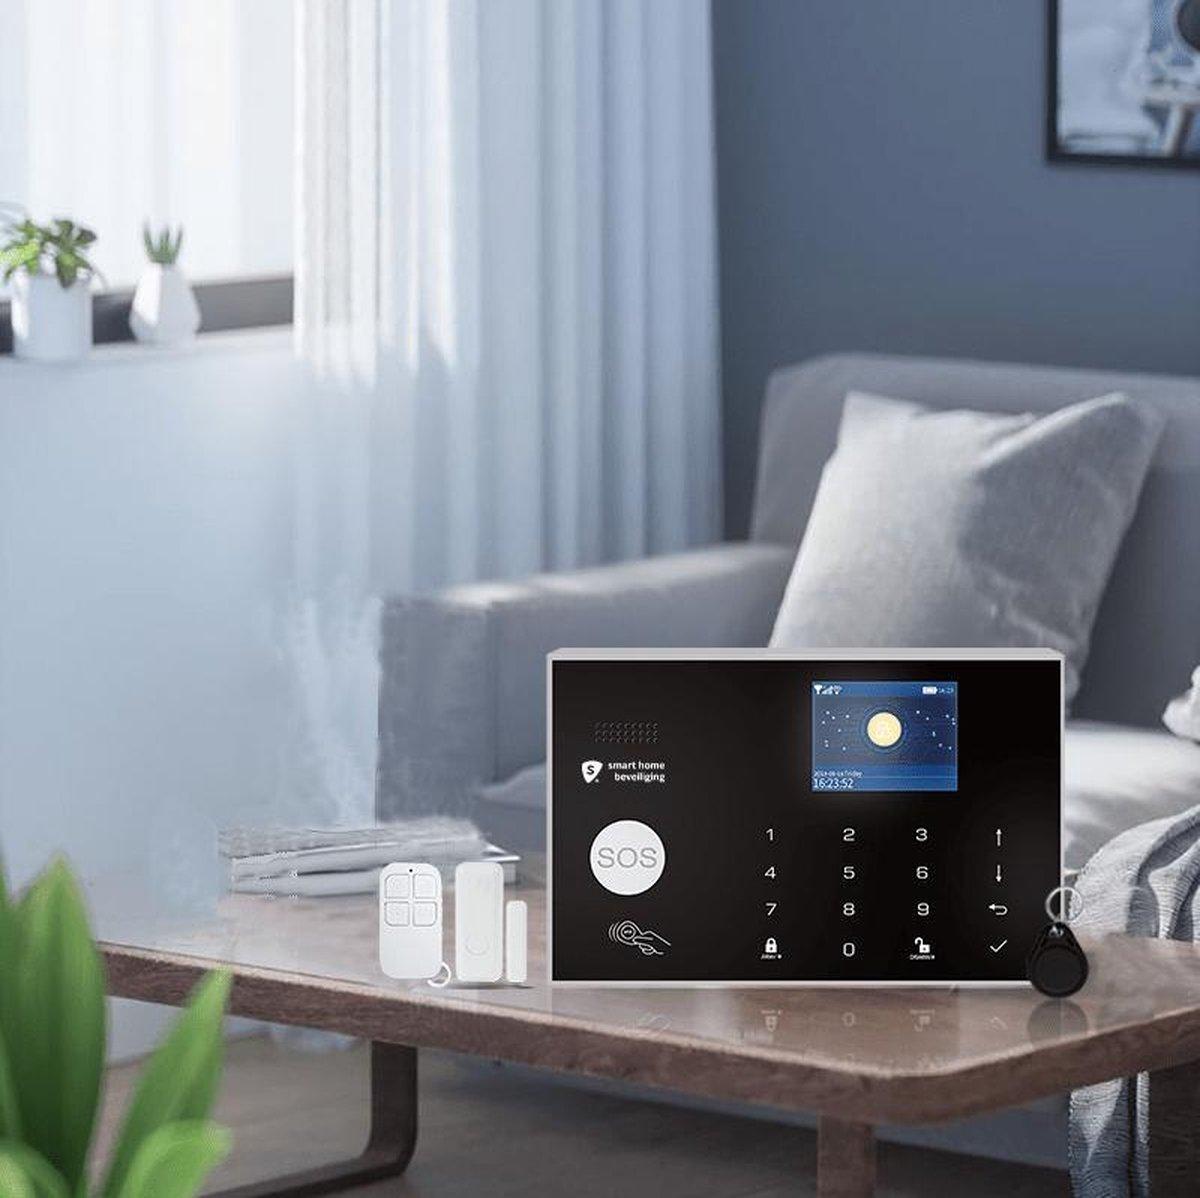 Alarmhub 2 start alarmsysteem - keypad - uitbreidbaar- thuis modus - wifi - Sirene - Melding op app - SMS, GSM en SIM kaart - Back up batterij - Smart Home Beveiliging